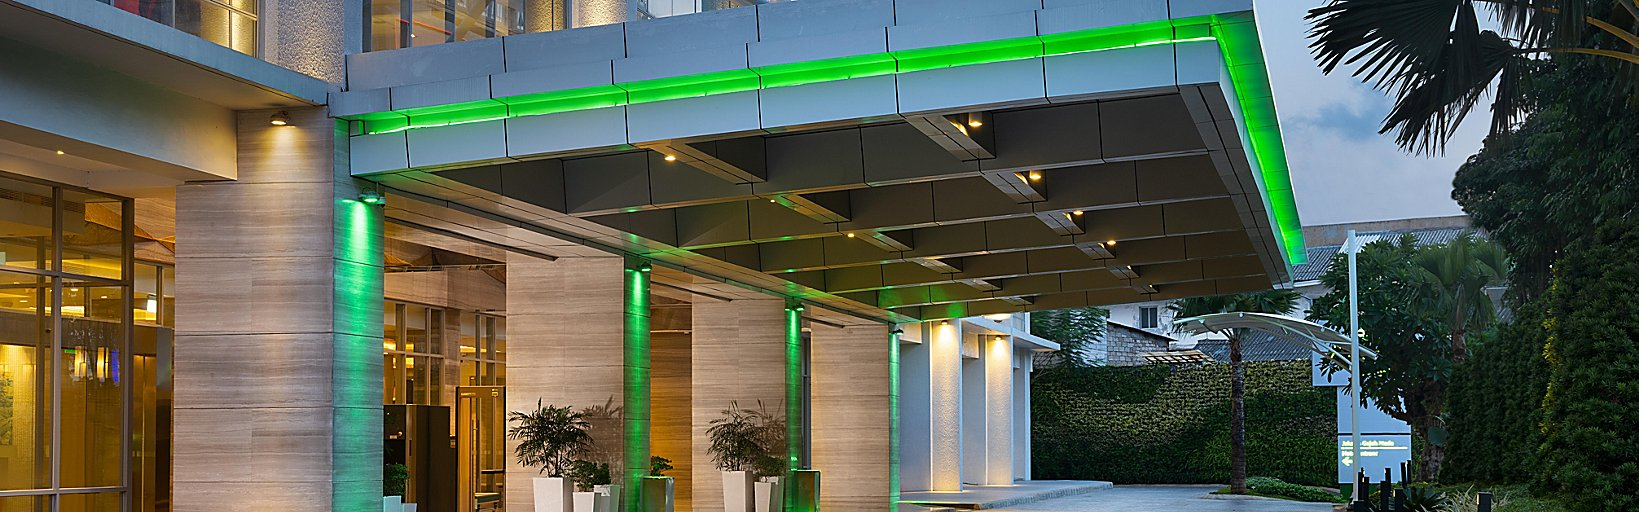 Holiday Inn Hotel Suites Jakarta Gajah Mada Hotel Reviews Photos